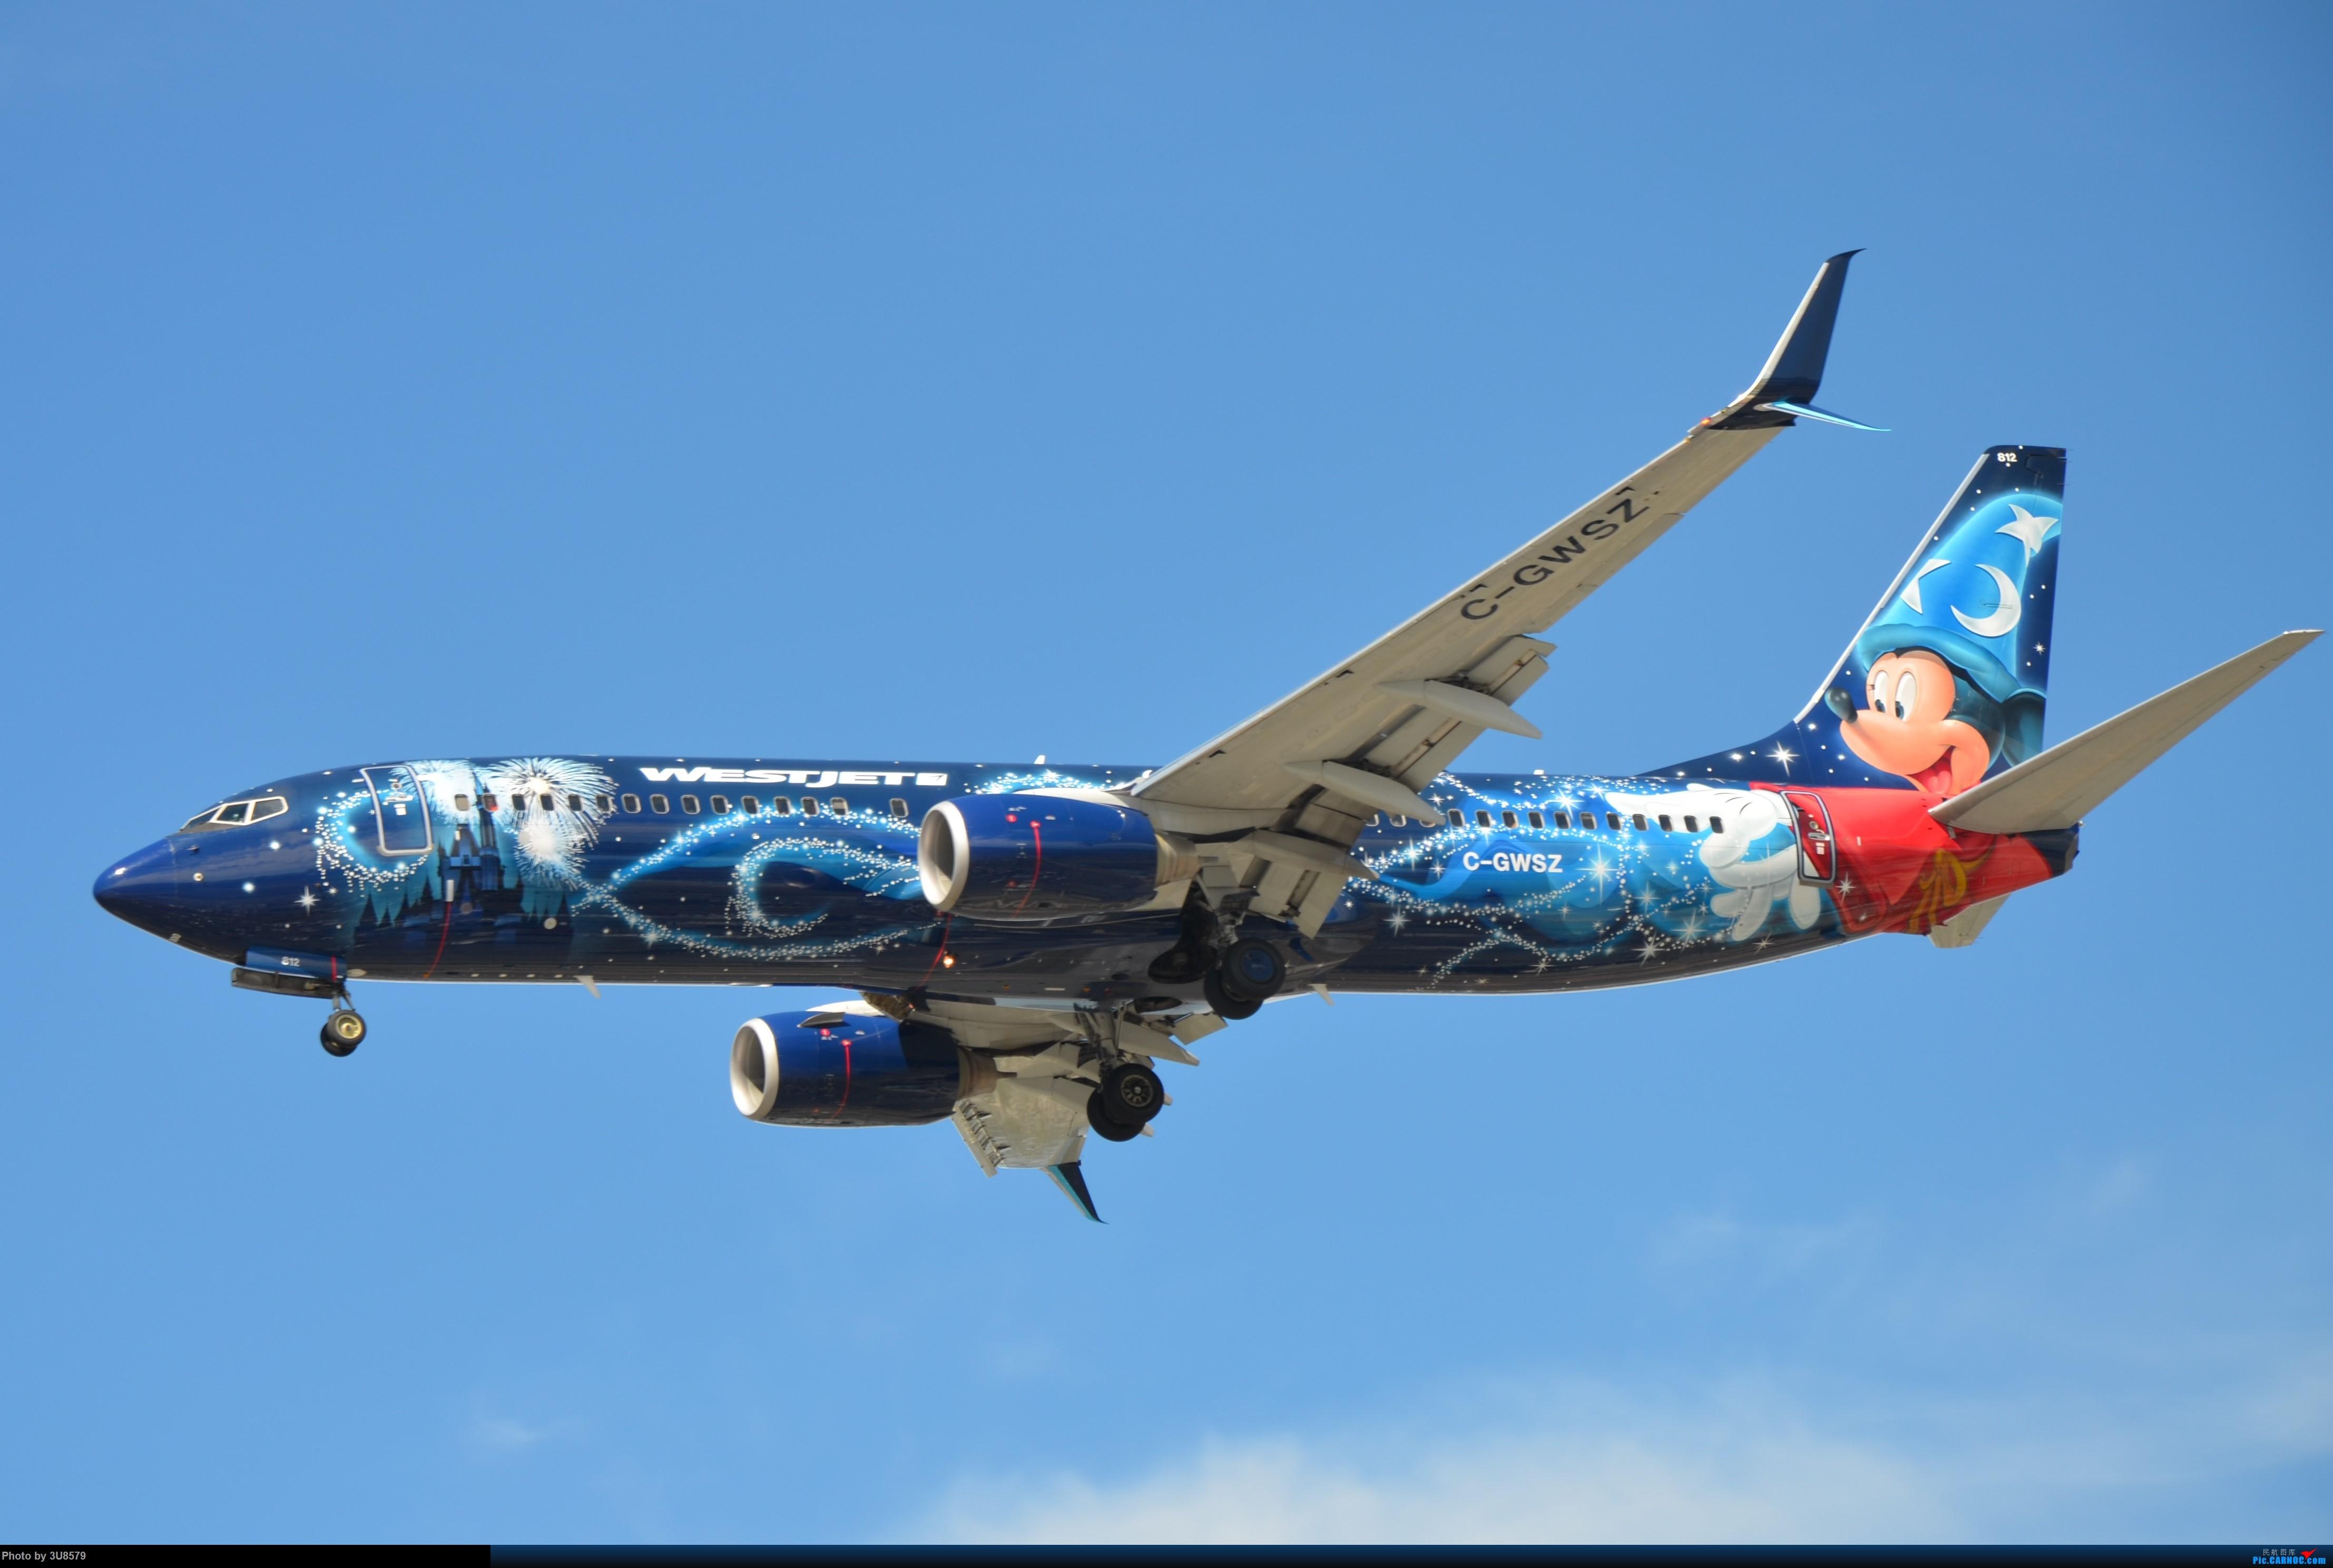 Re:[原创]YVR温哥华拍机 BOEING 737-800 C-GWSZ 加拿大温哥华机场